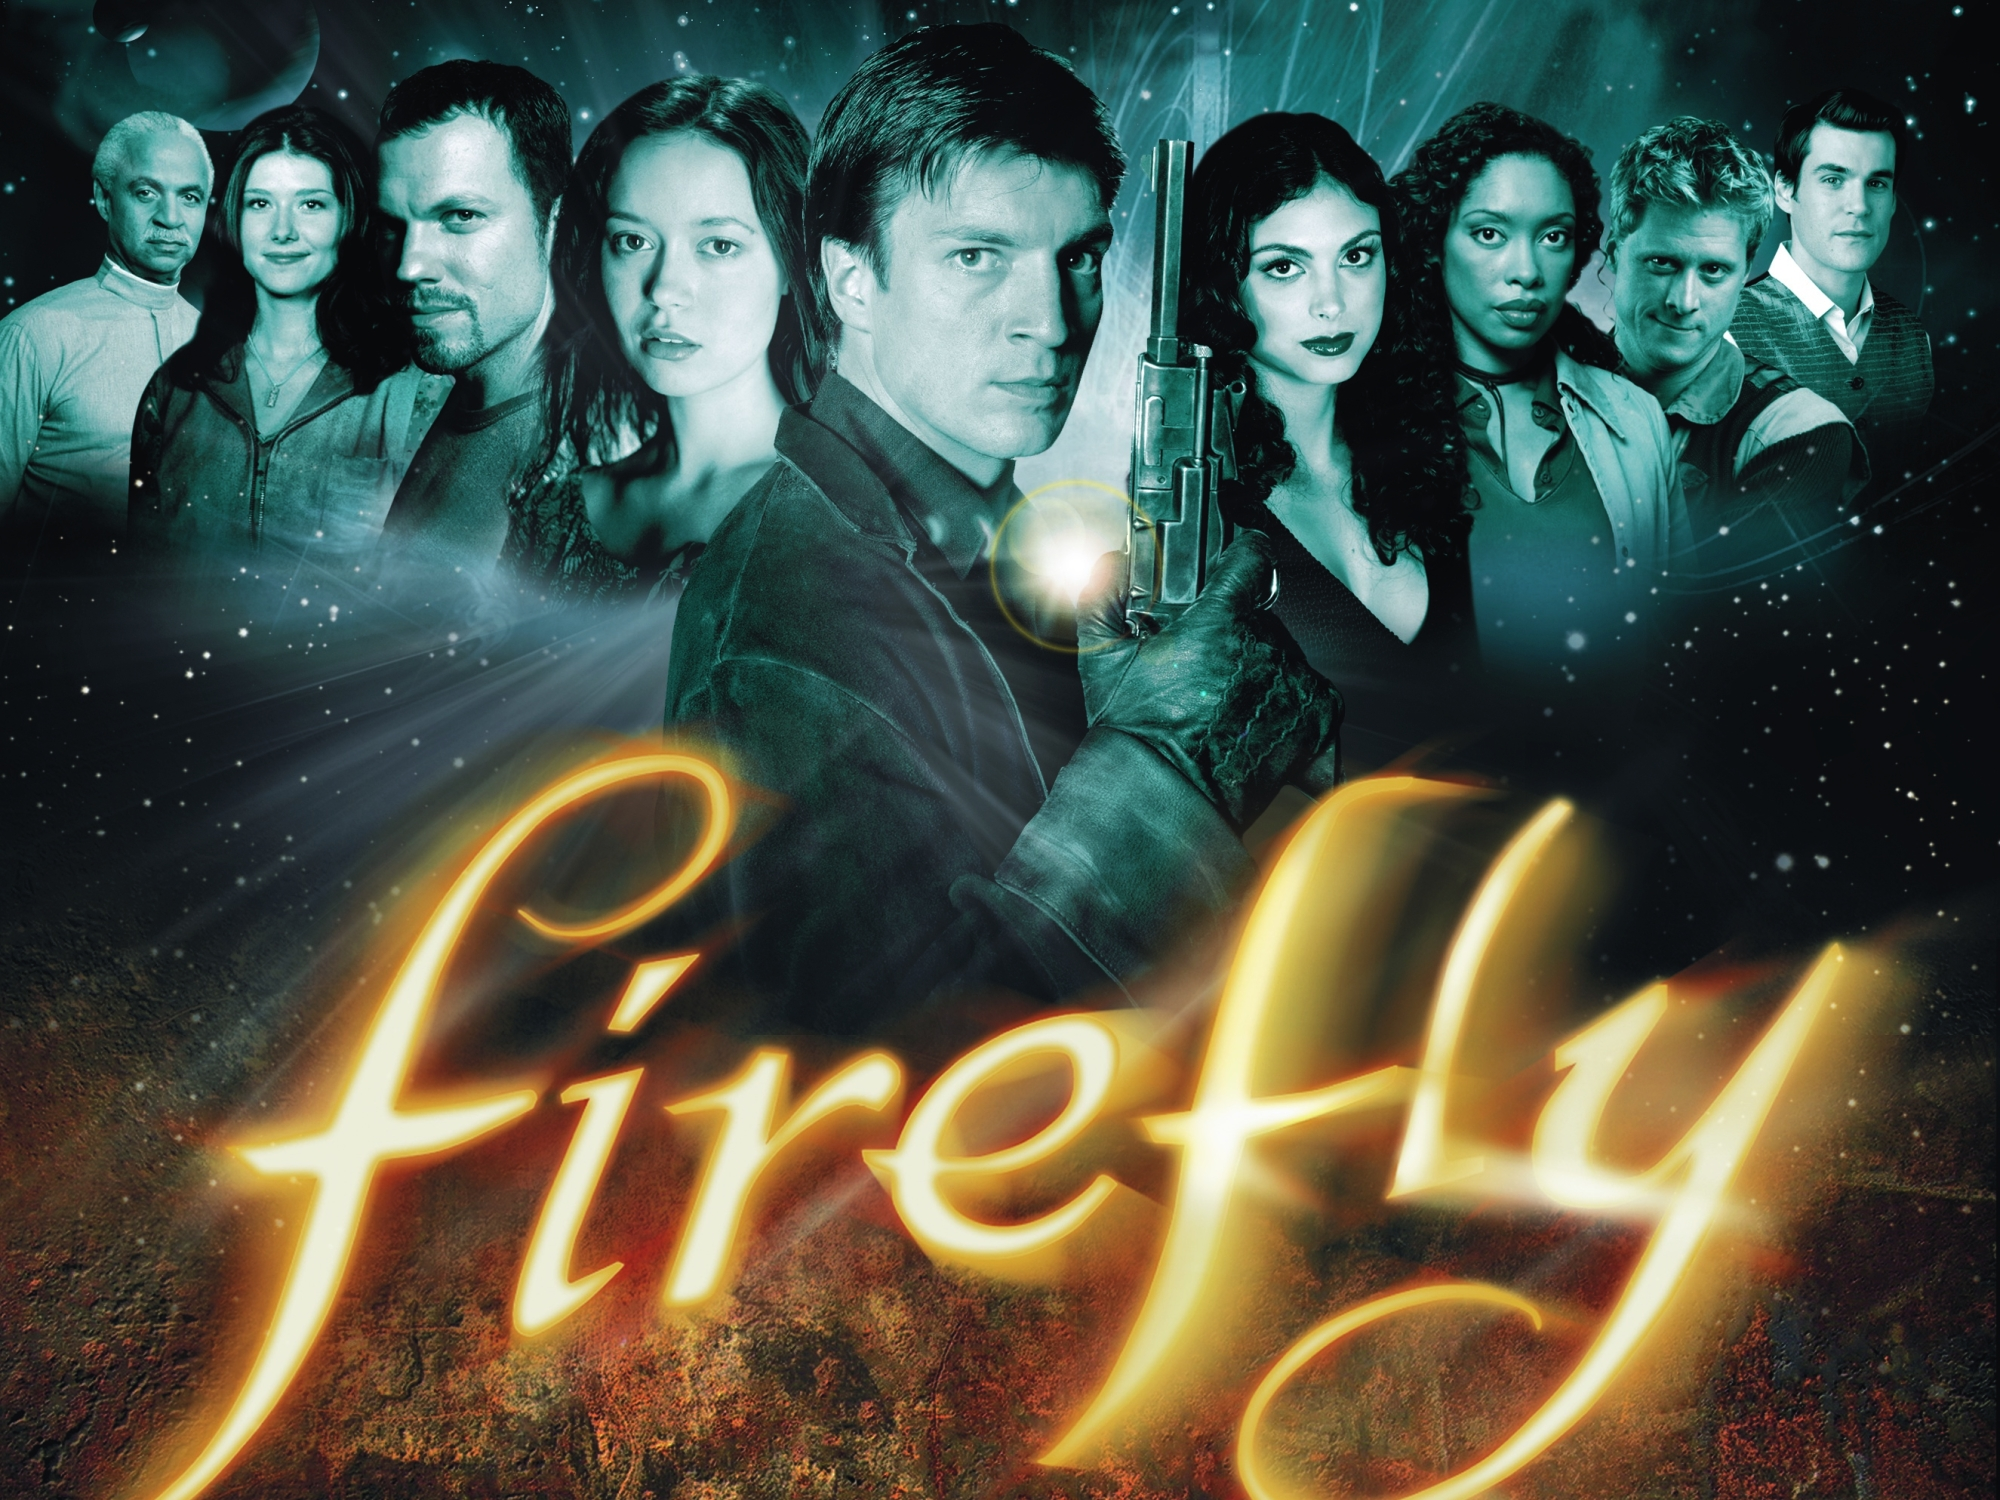 Serie: Firefly